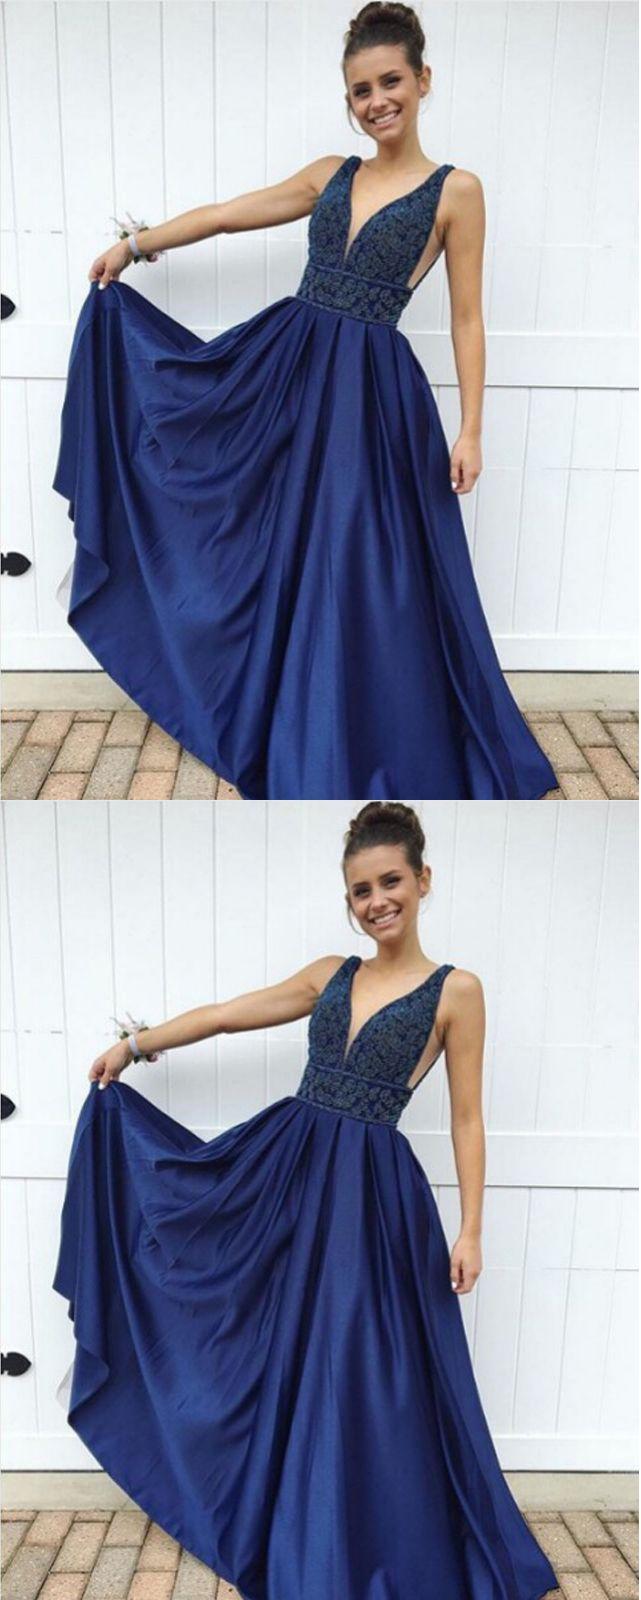 Fashion aline vneck navy blue long promevening dress with beading